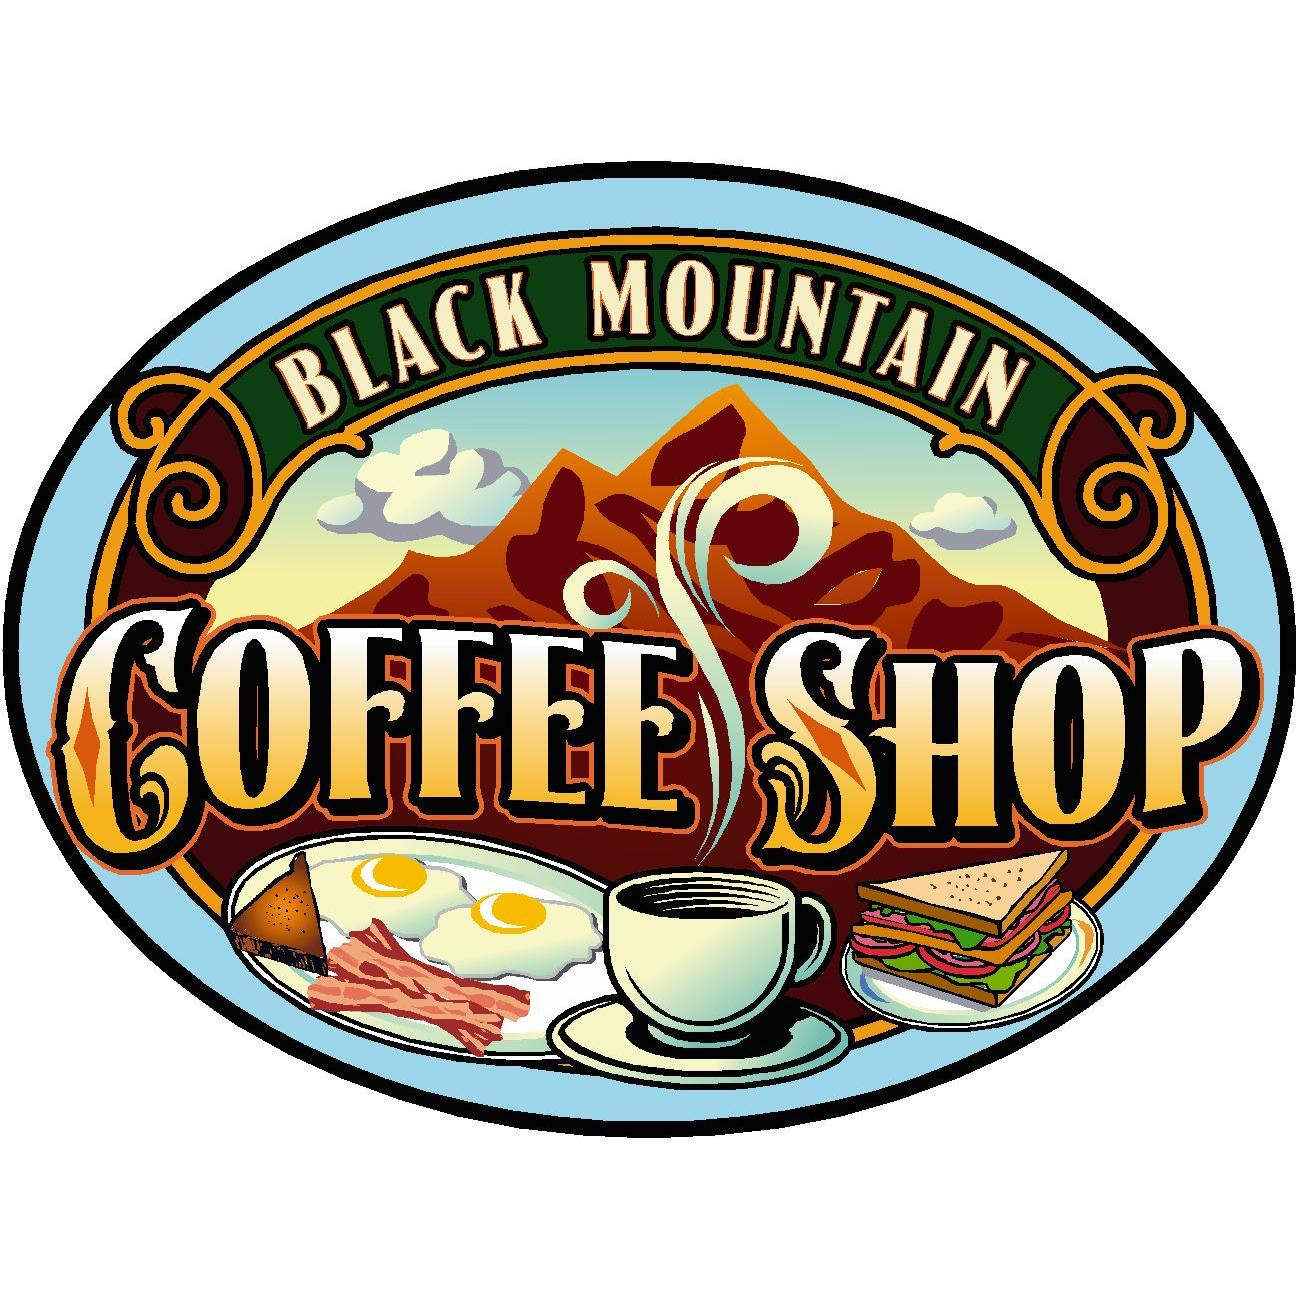 Black Mountain Coffee Shop